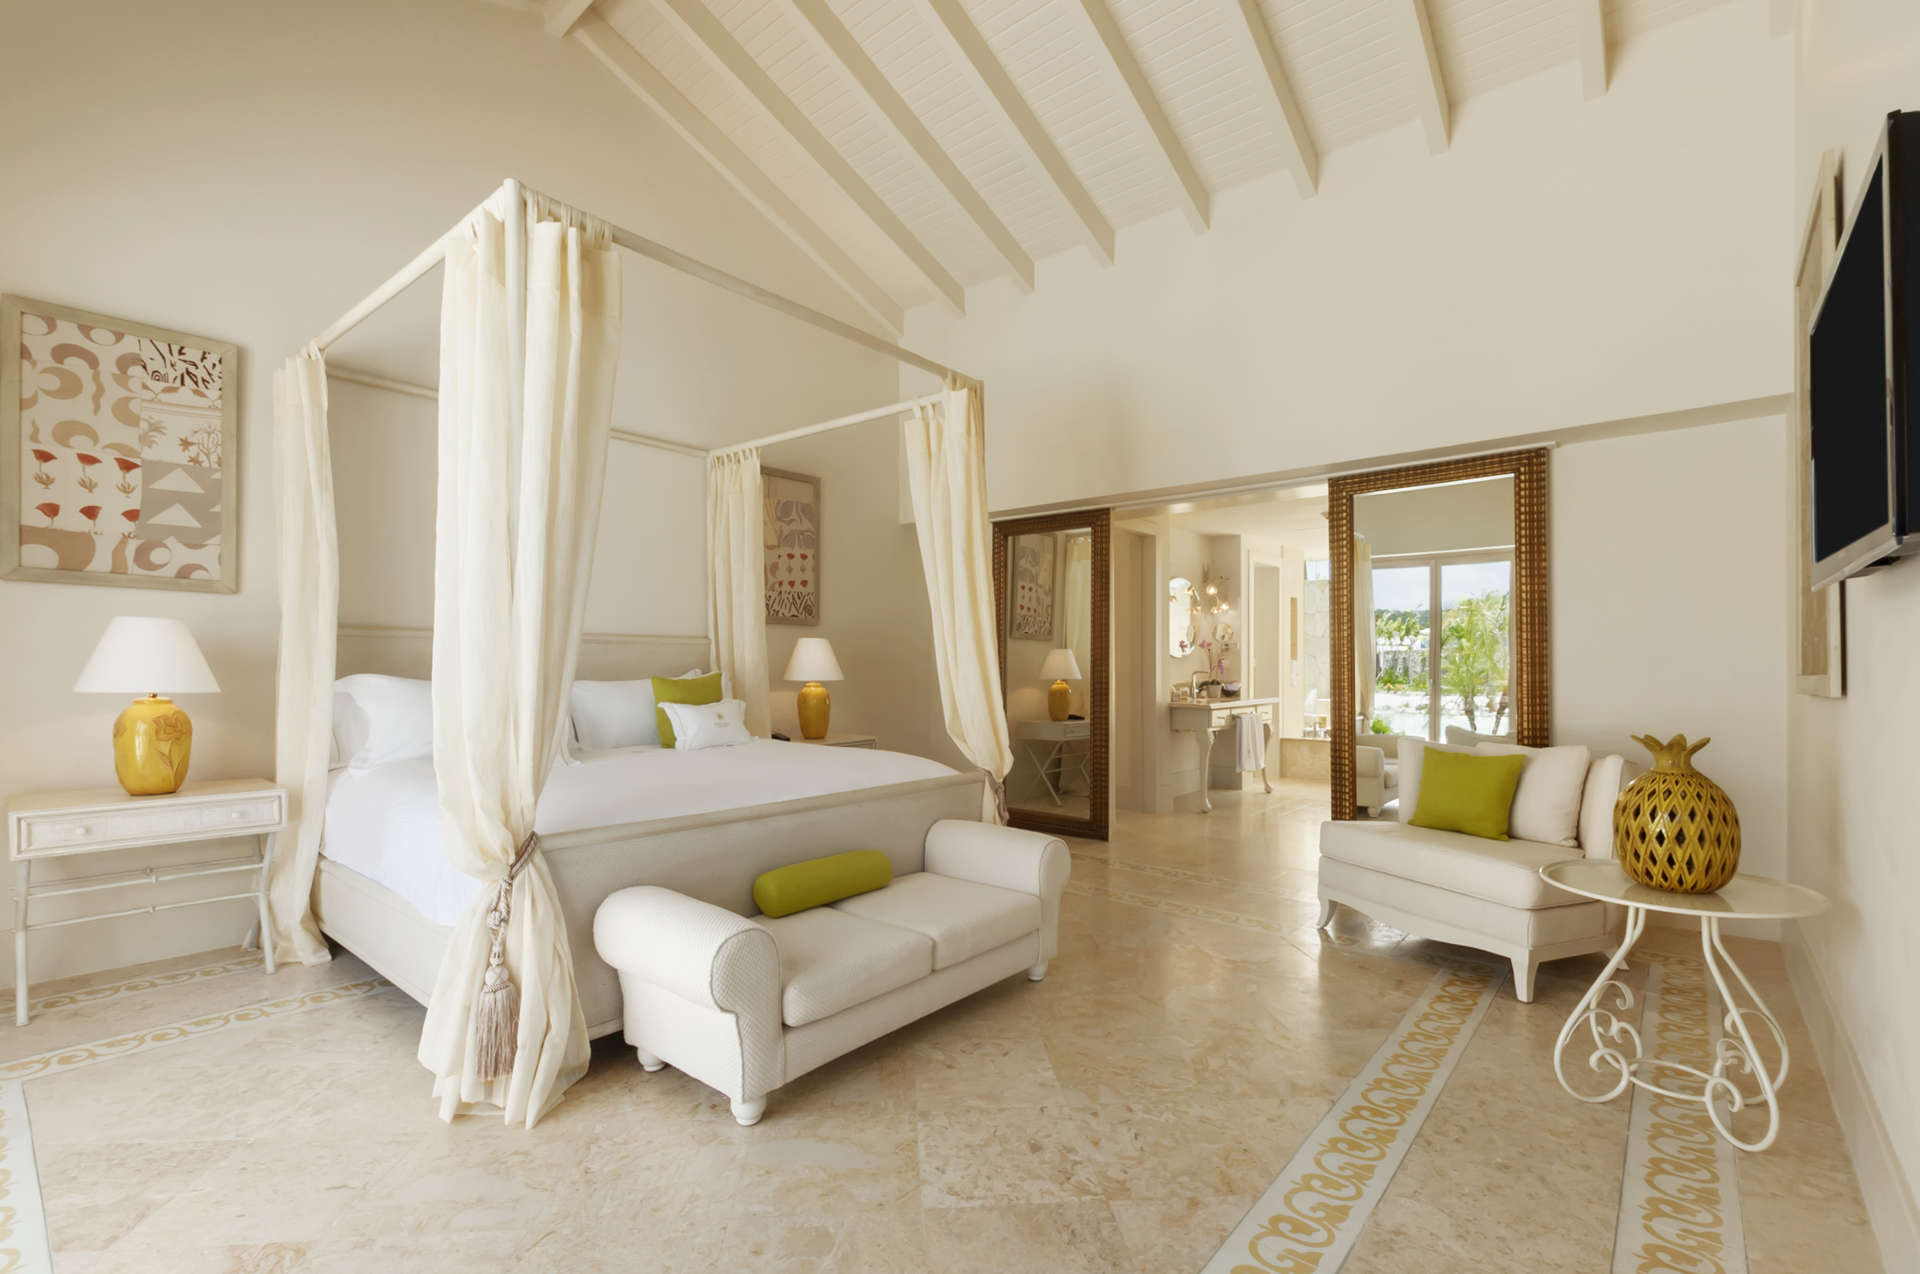 Luxury villa rentals caribbean - Dominican republic - Punta cana - Eden roc at cap cana - Luxury Family Pool Suite - Image 1/11